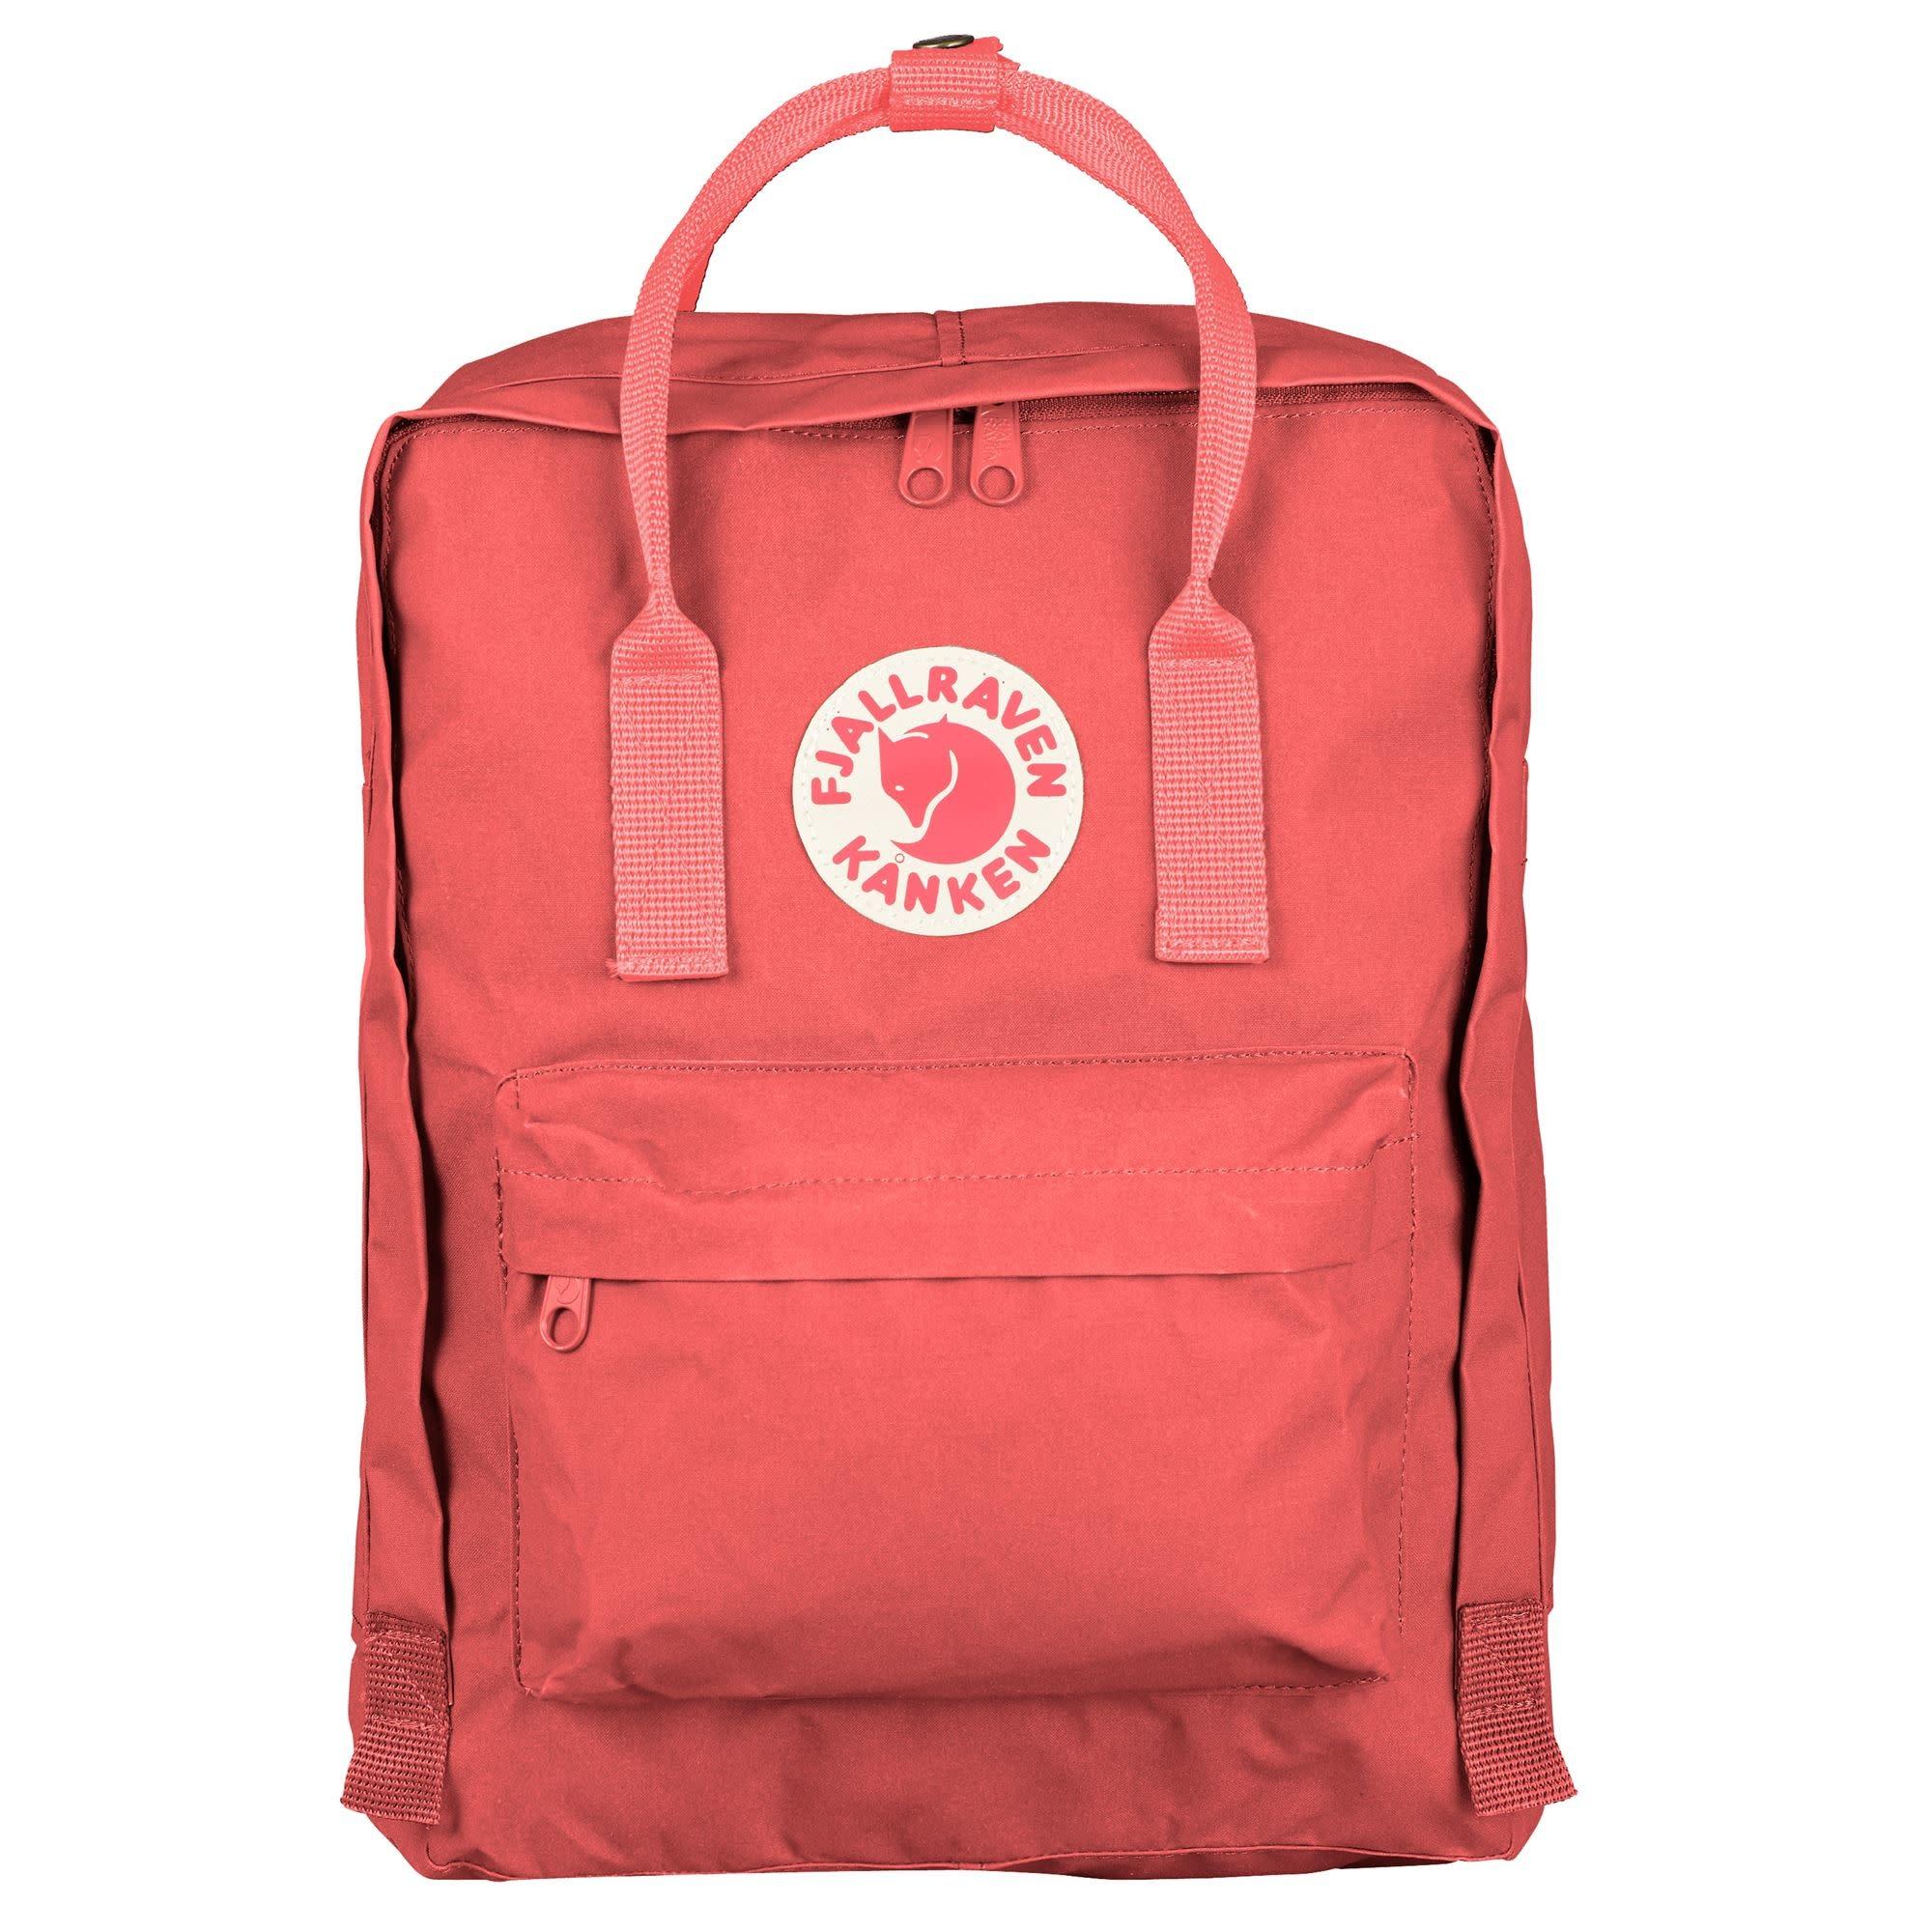 Fjallraven Kanken Classic Backpack - Peach Pink